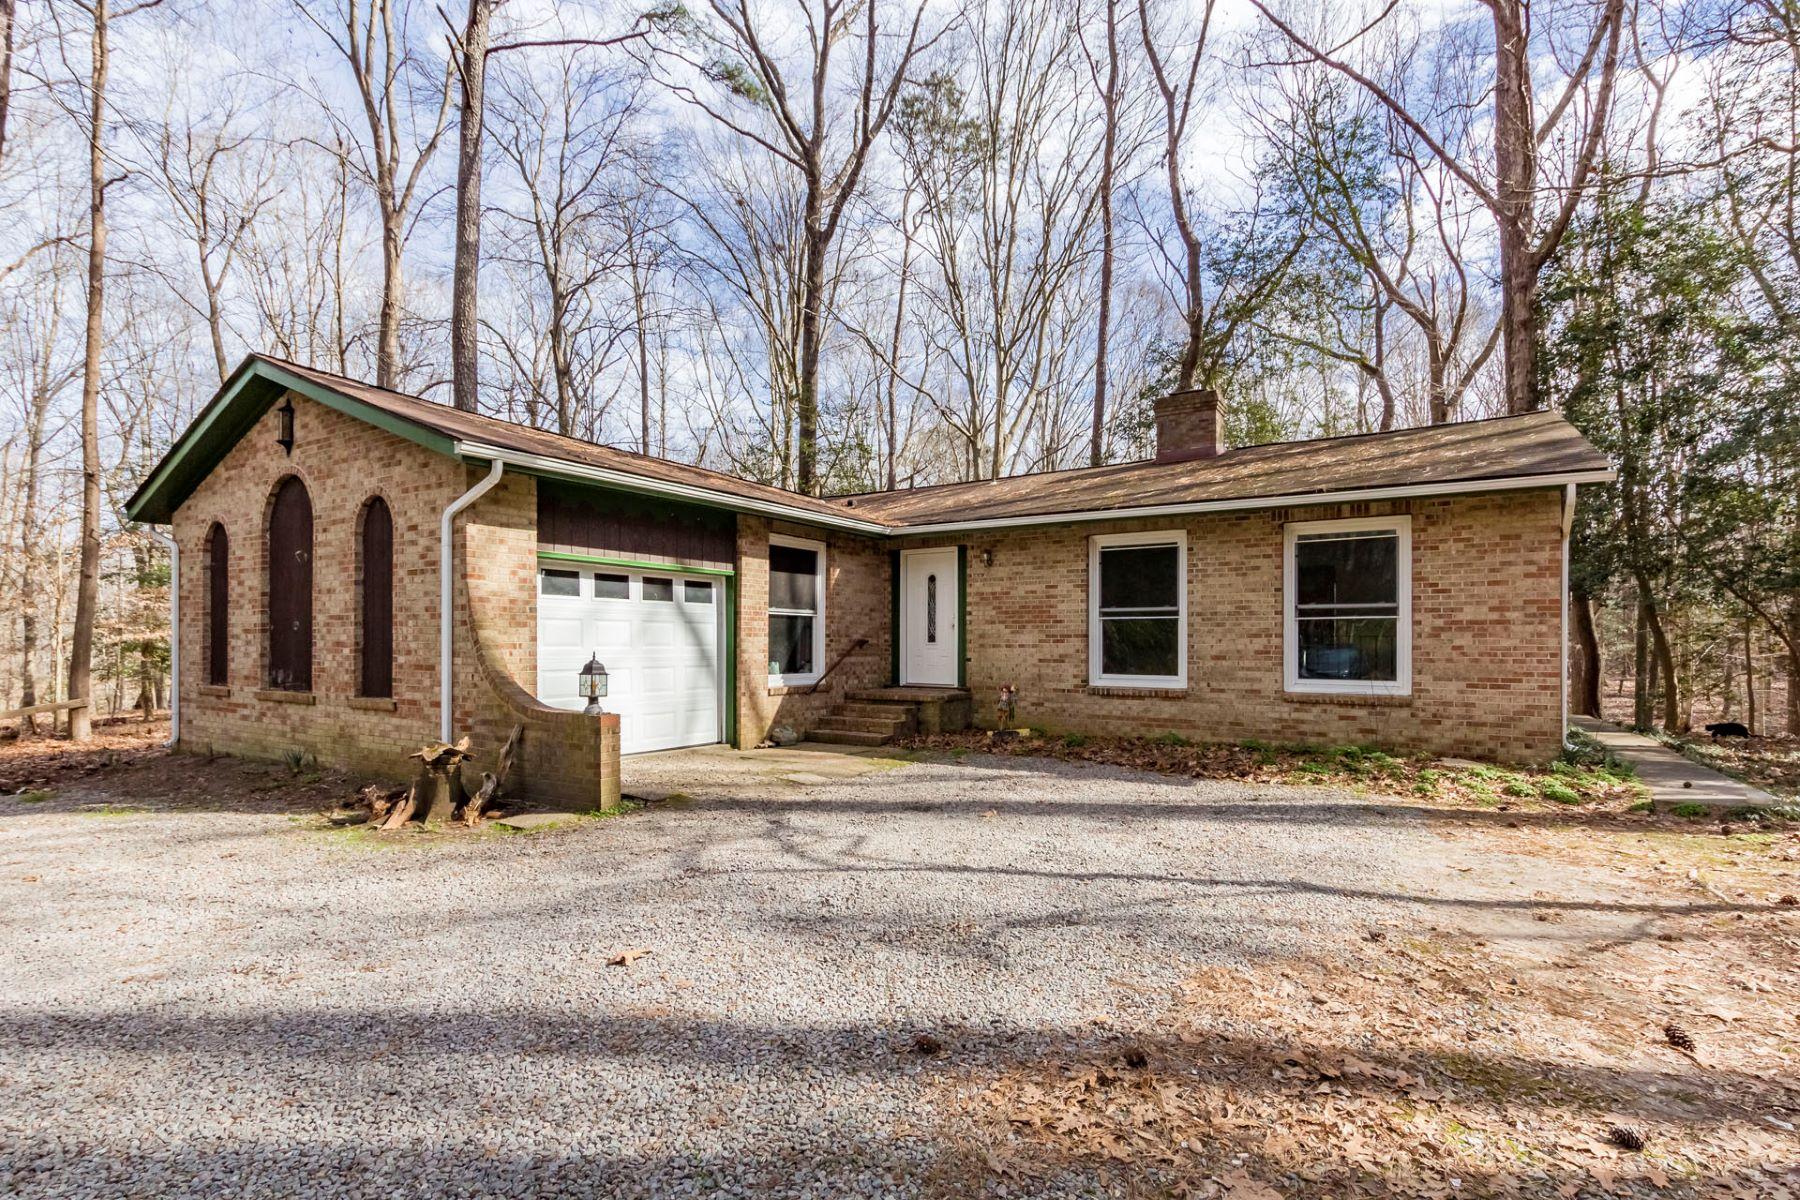 Single Family Home for Sale at 14041 Foursquare Road 14041 Foursquare Road Smithfield, Virginia 23430 United States